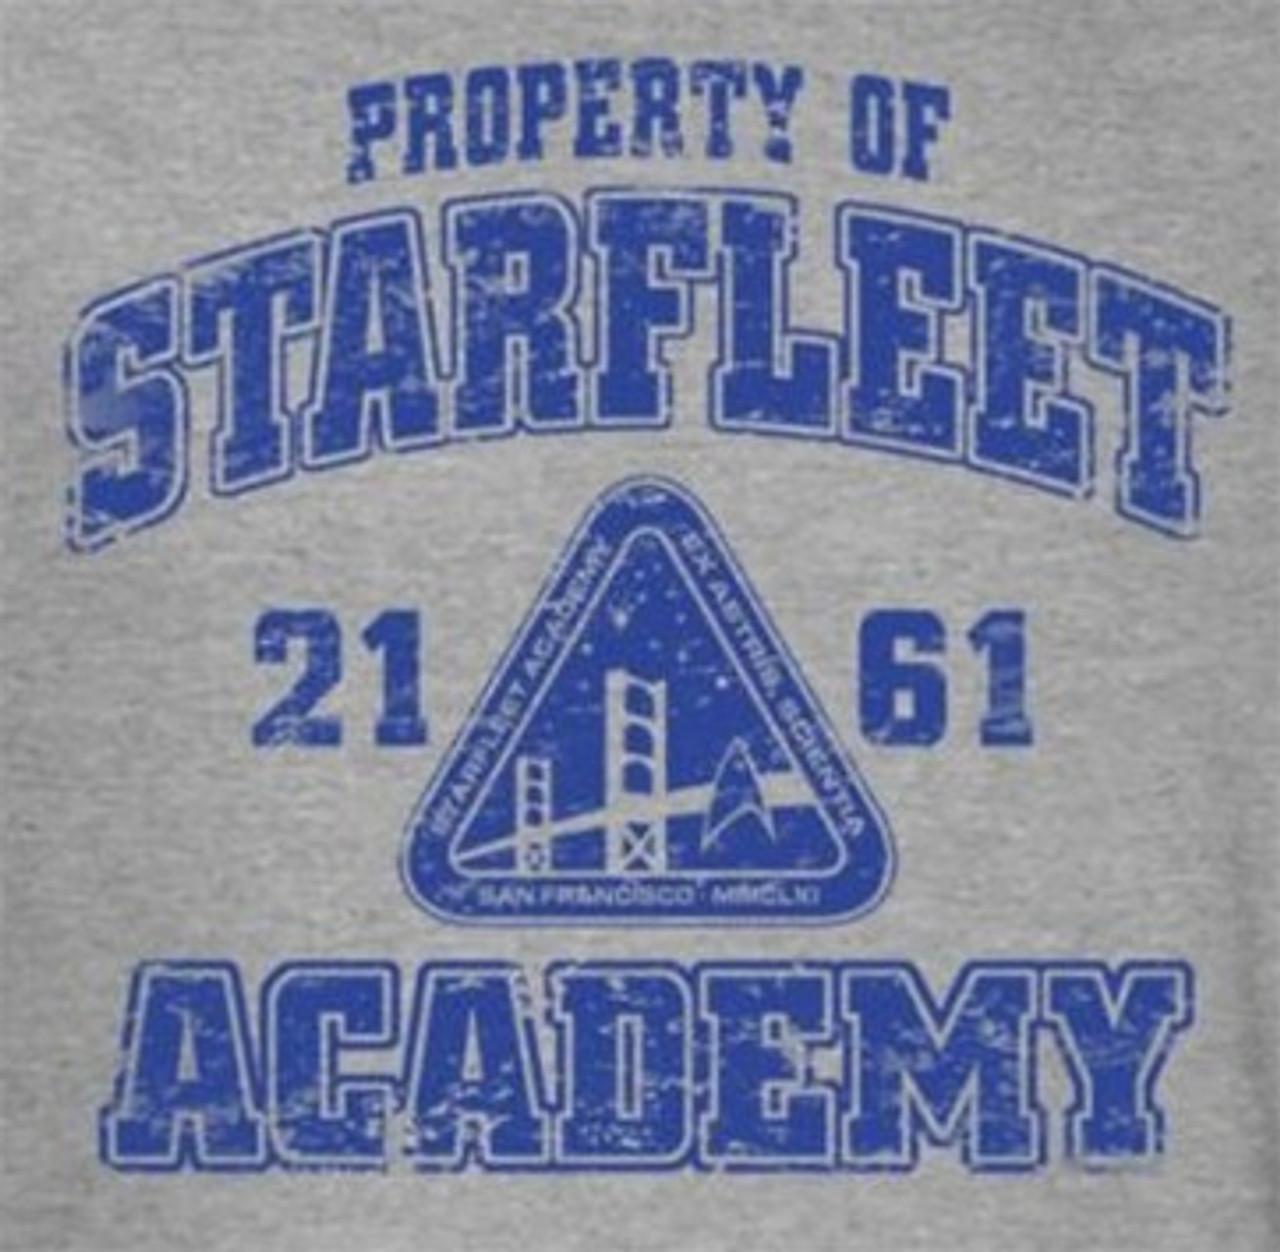 Star Trek STARFLEET ACADEMY EARTH Licensed Adult Heather T-Shirt All Sizes